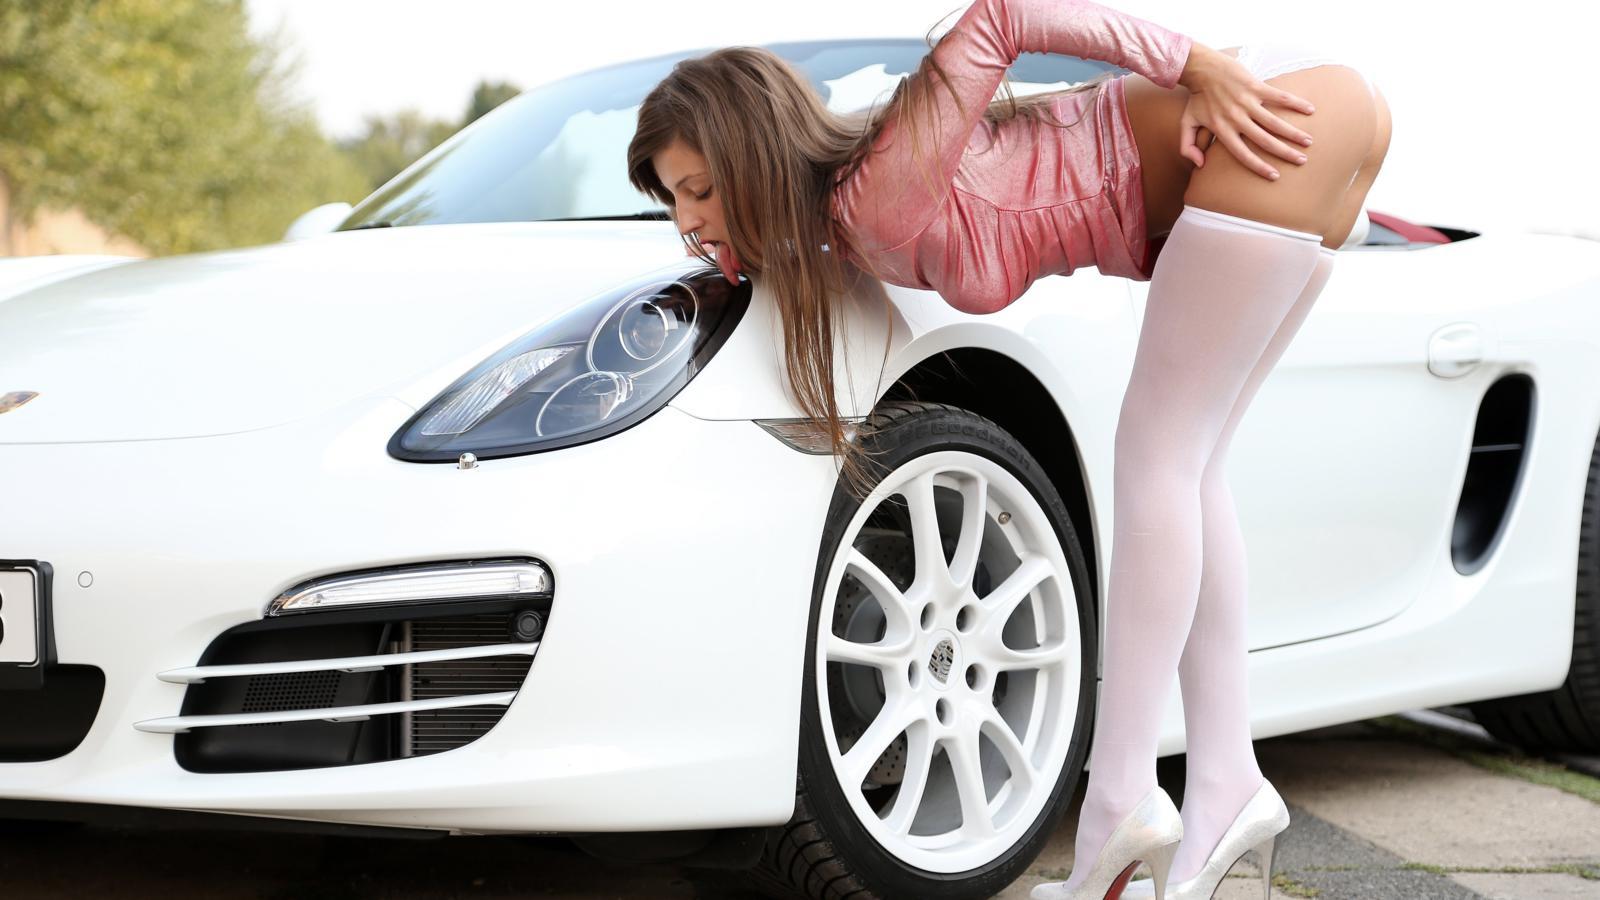 All Car Wallpaper Download Download Photo 1600x900 Maria Ryabushkina Tara Brunette